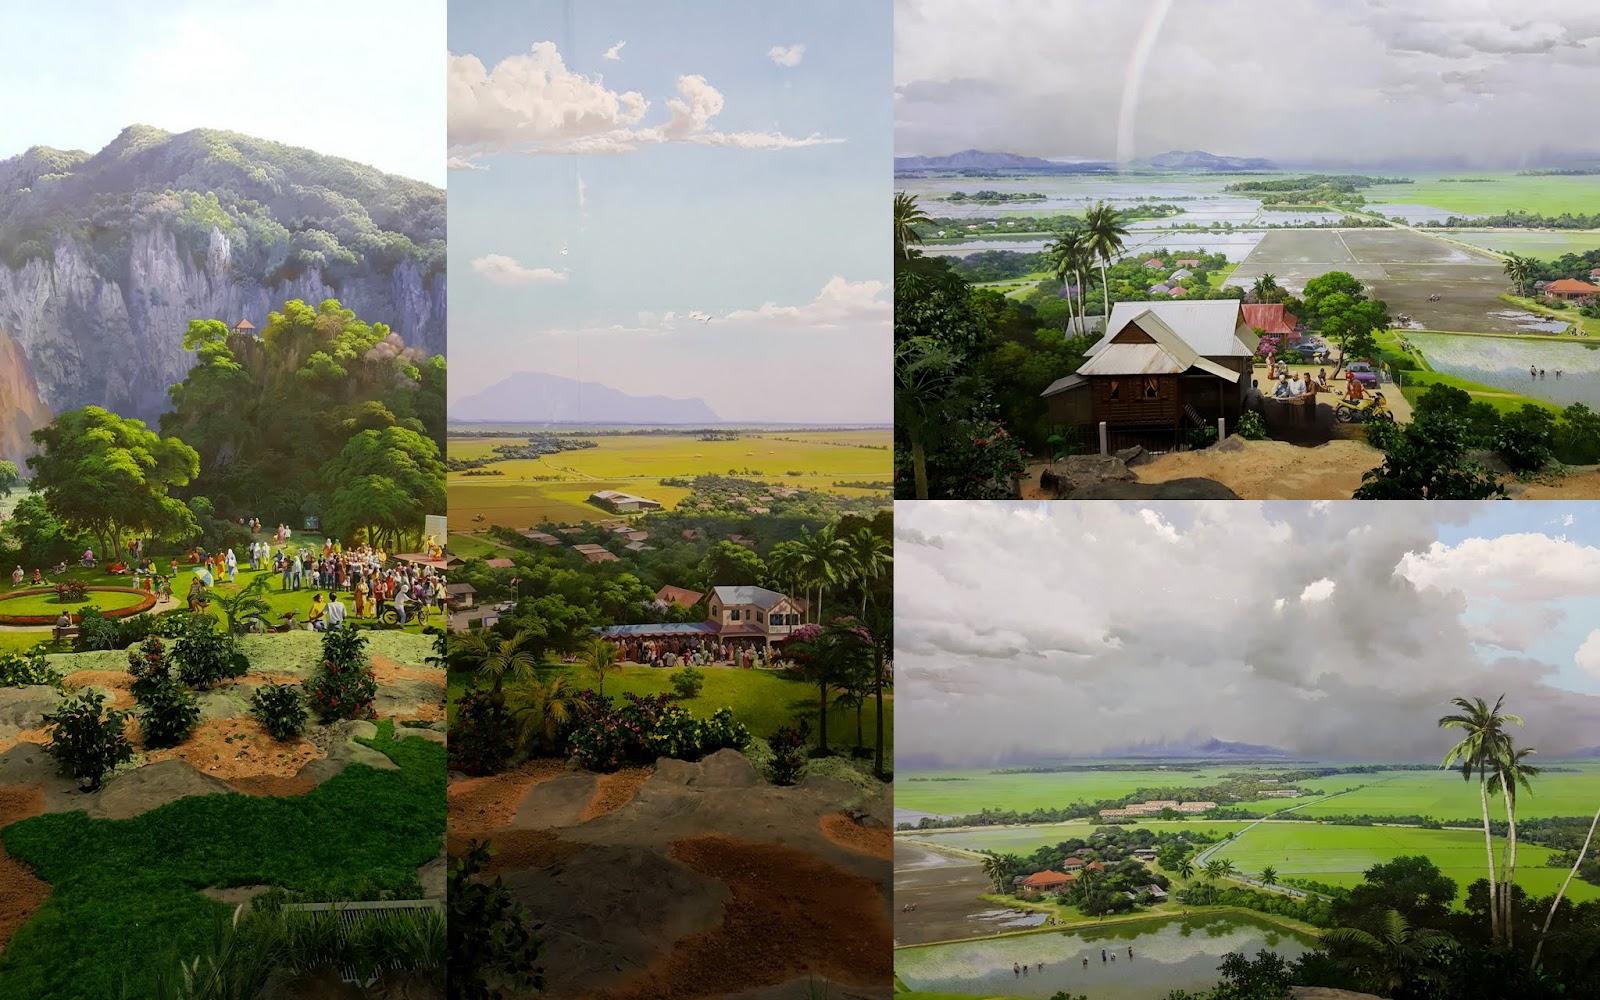 Pemandangan dari Puncak Gunung Keriang